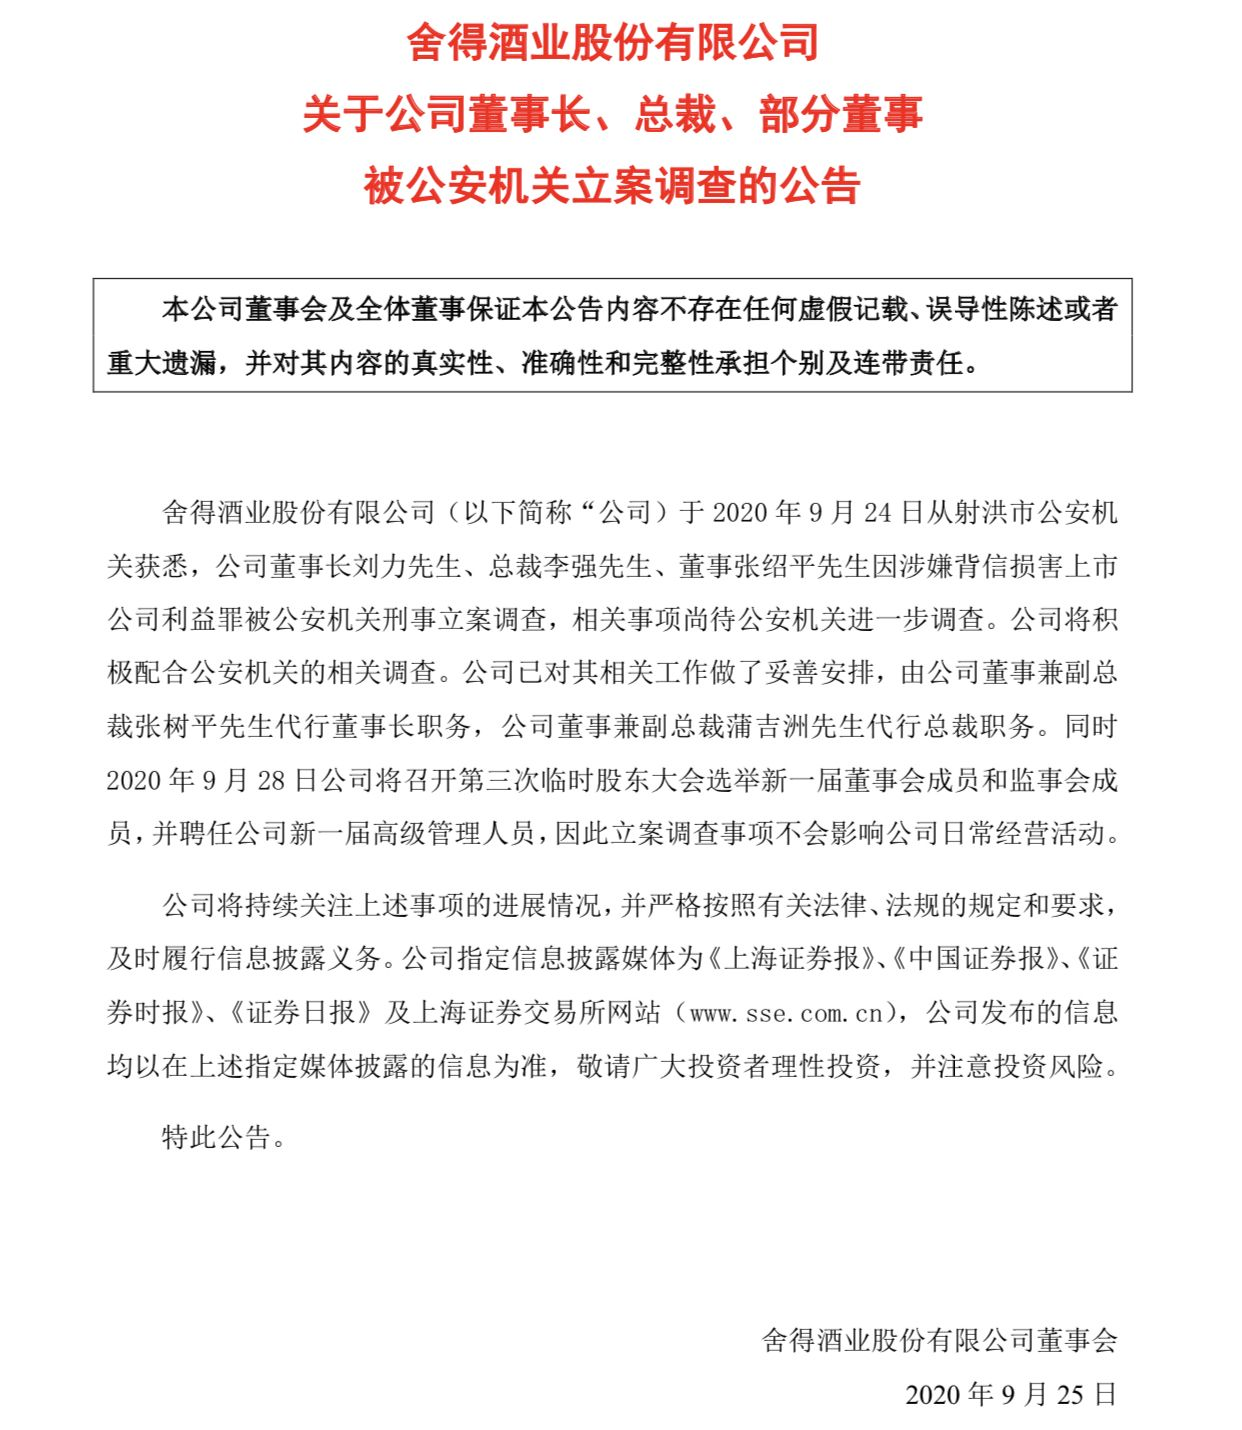 ST舍得:公司董事长刘力、总裁李强被刑事立案调查图片